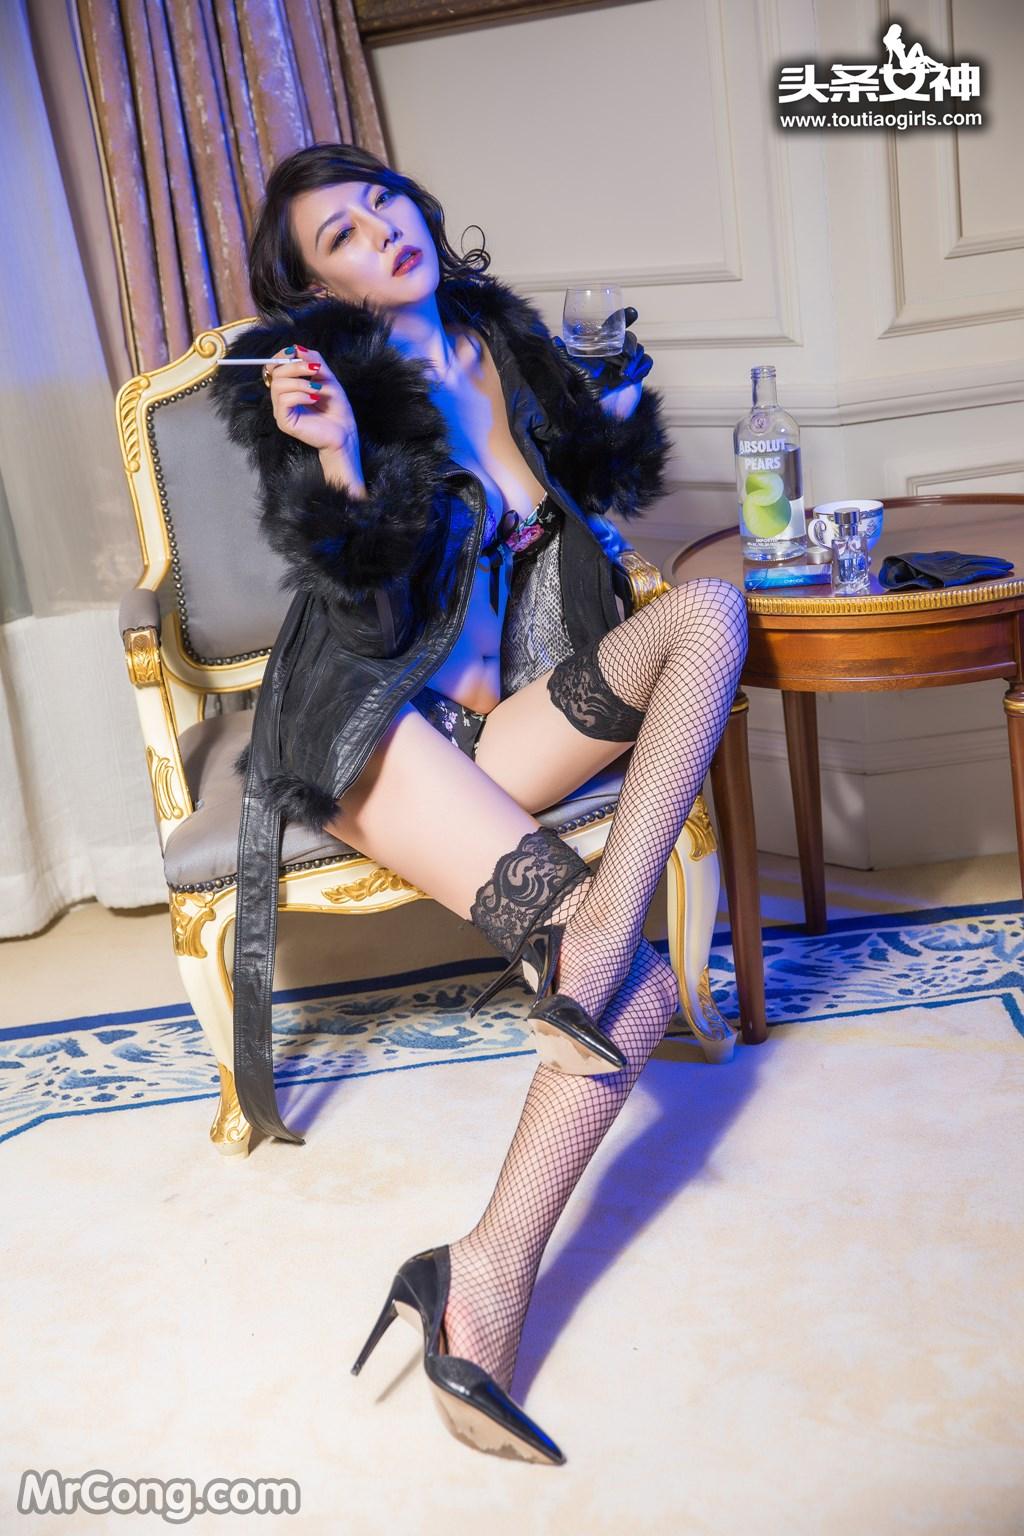 Image MrCong.com-TouTiao-2016-12-26-Dan-Dan-006 in post TouTiao 2016-12-26: Người mẫu Dan Dan (丹丹) (33 ảnh)